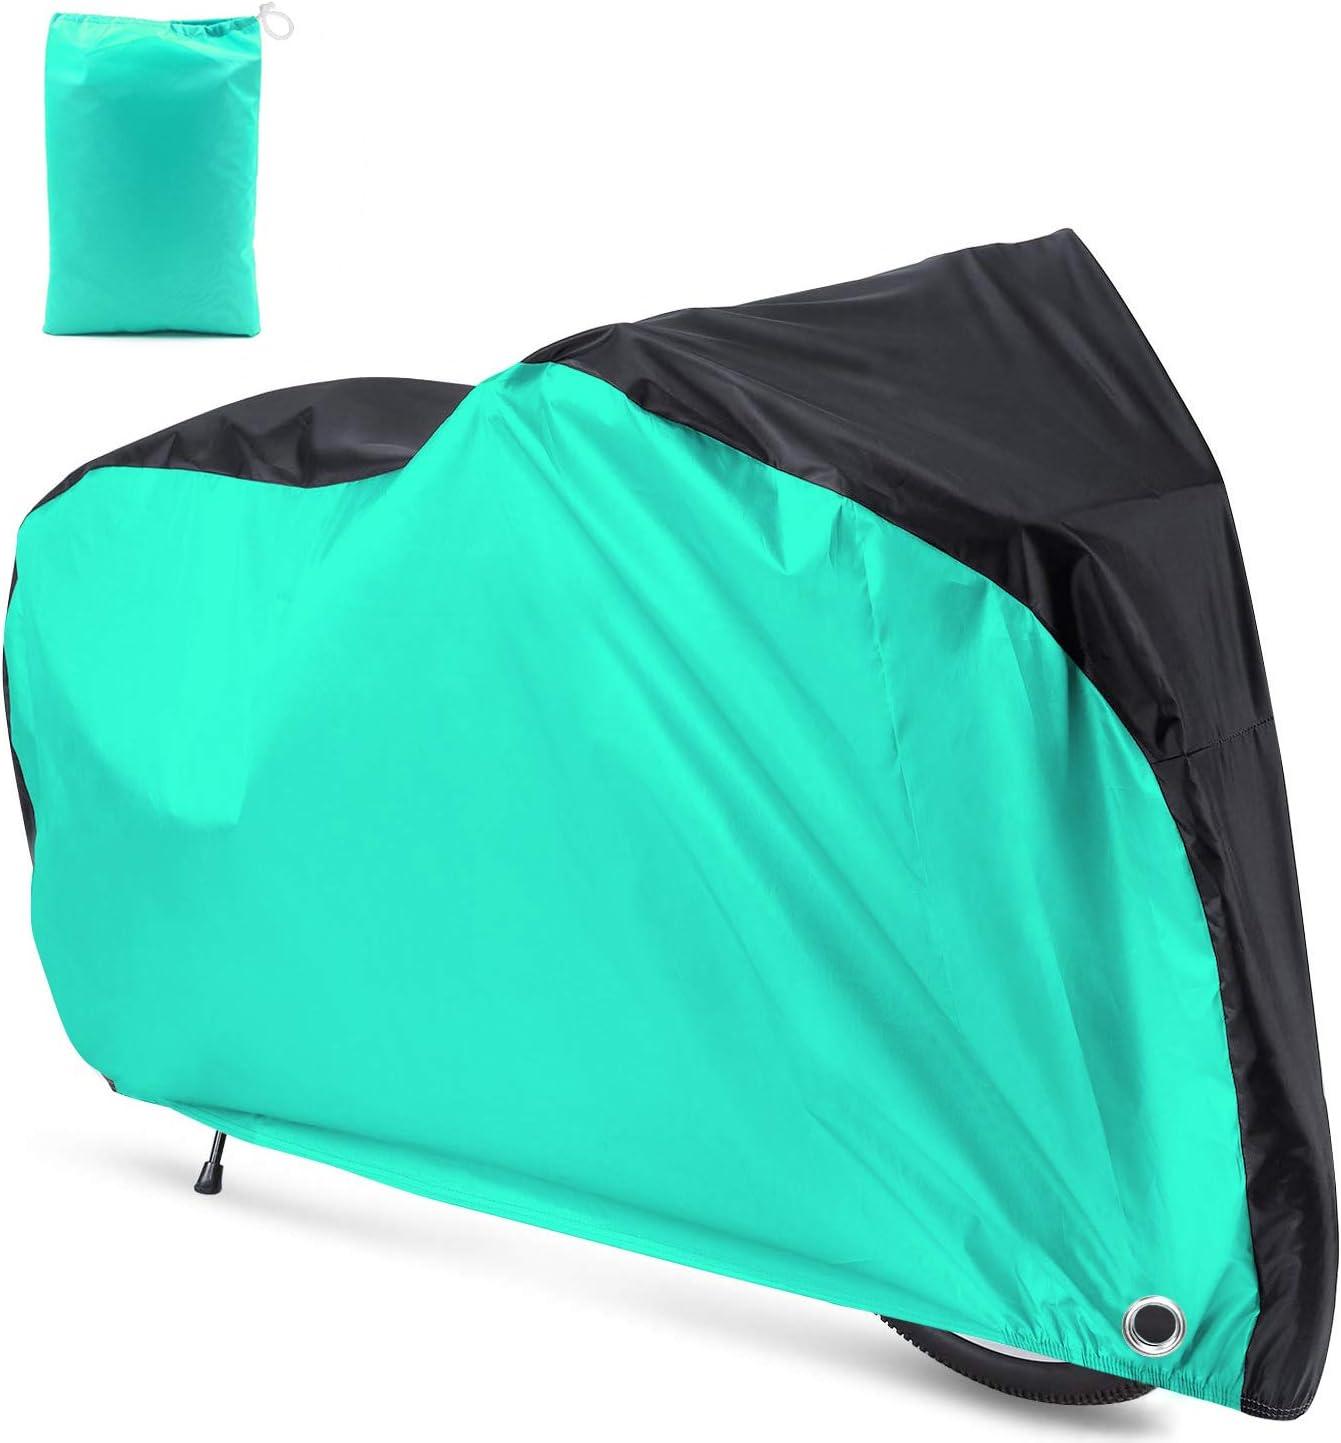 Bicycle Rain Cover Universal Waterproof Anti Dust Rain SCOOTER RAIN COVER